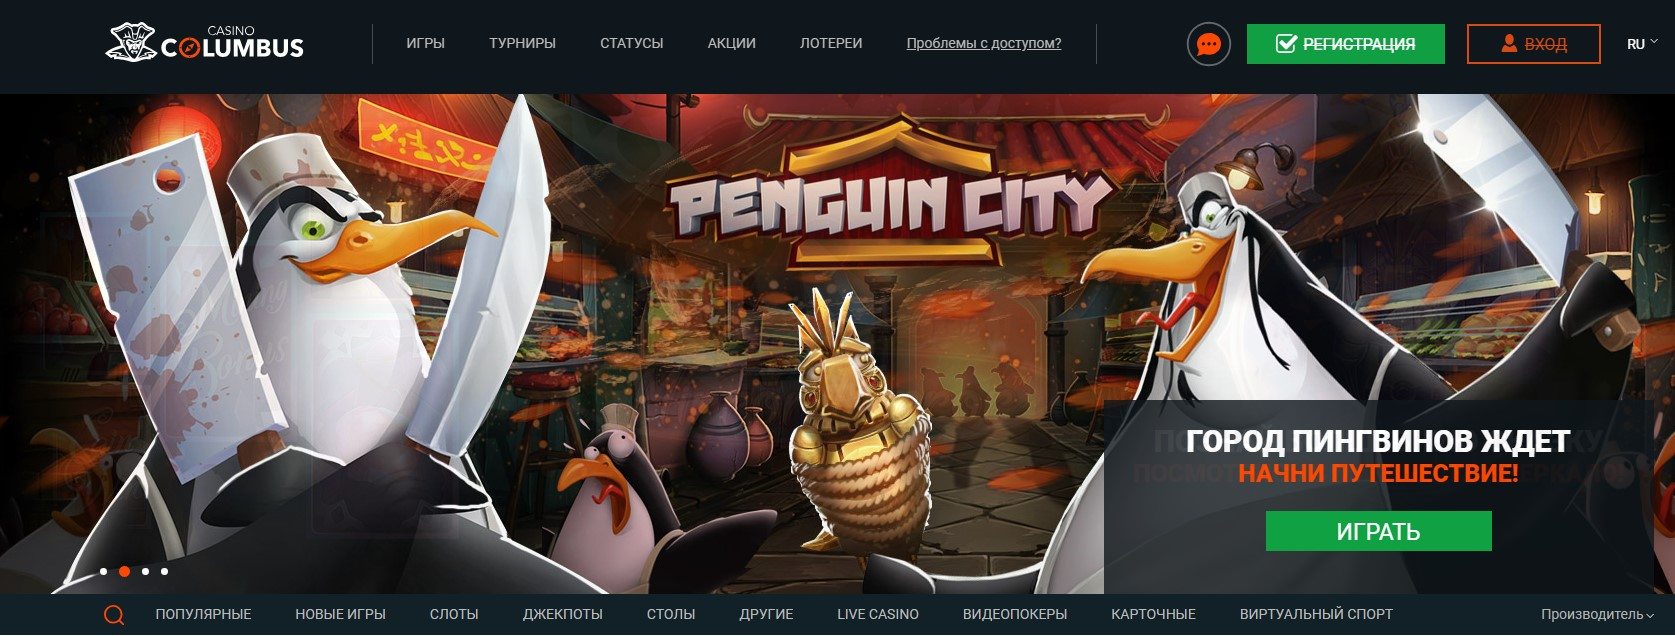 казино онлайн колумбус официальный сайт